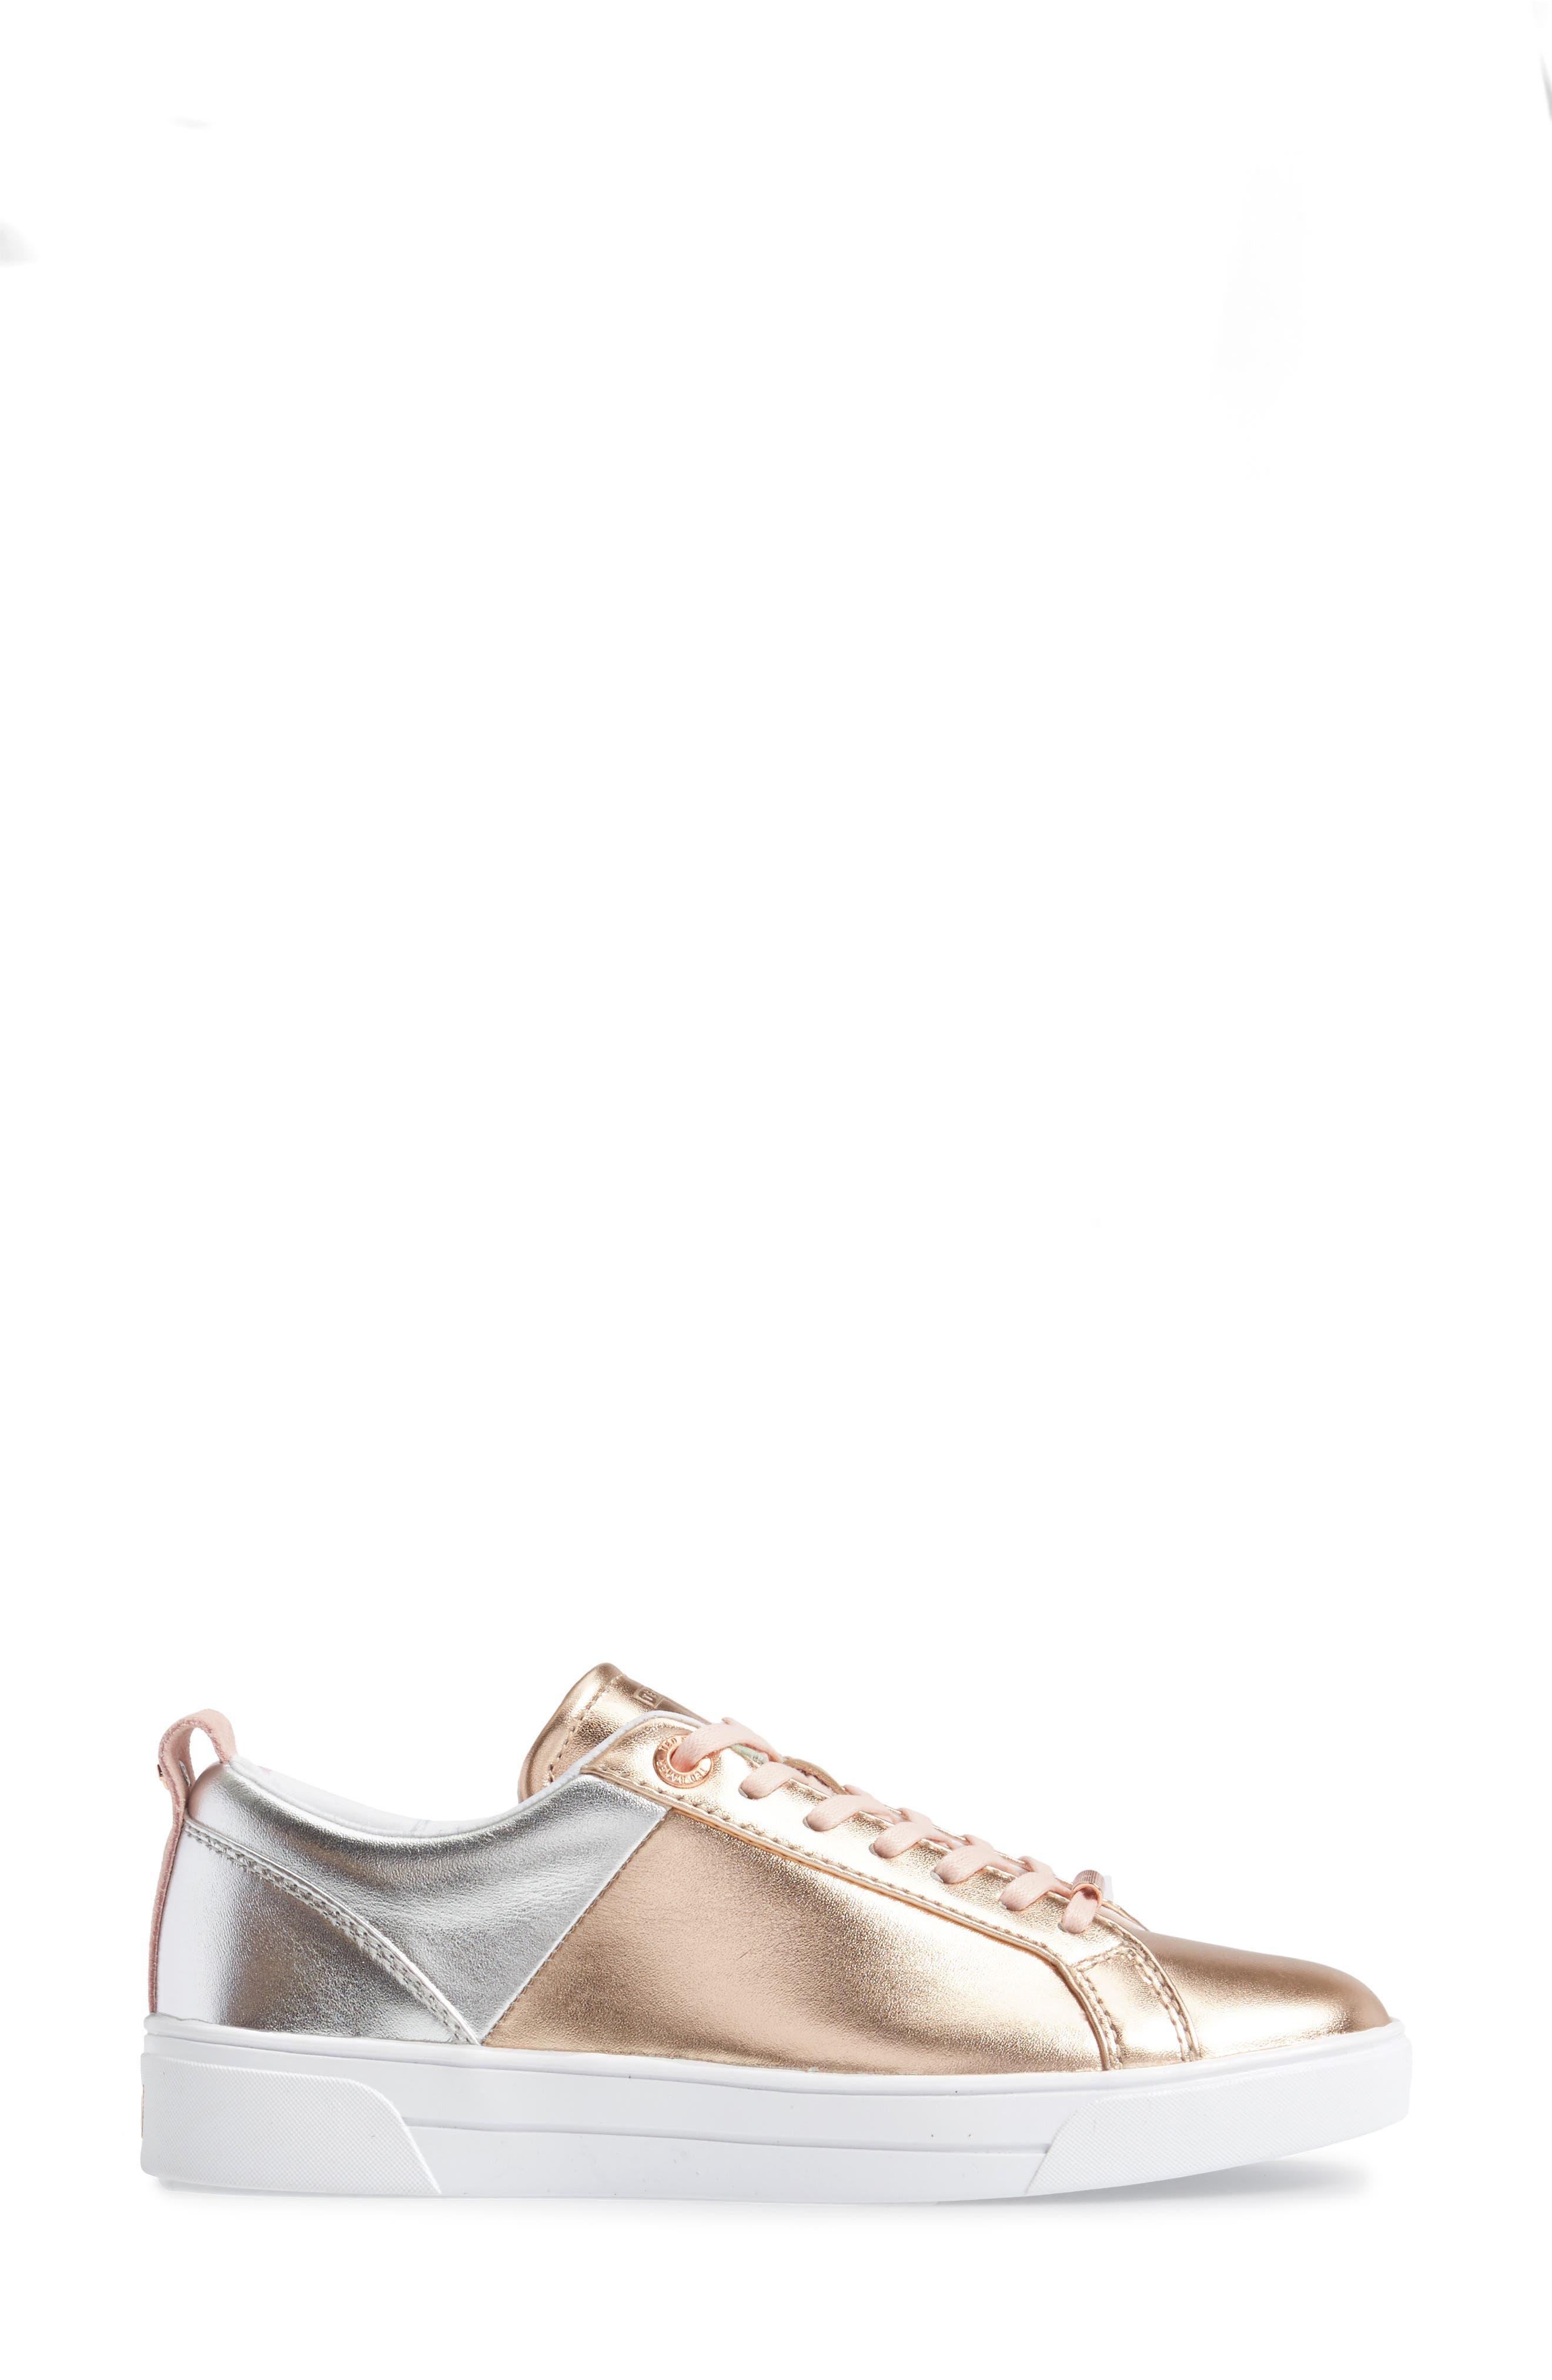 Kulei Lace-Up Sneaker,                             Alternate thumbnail 6, color,